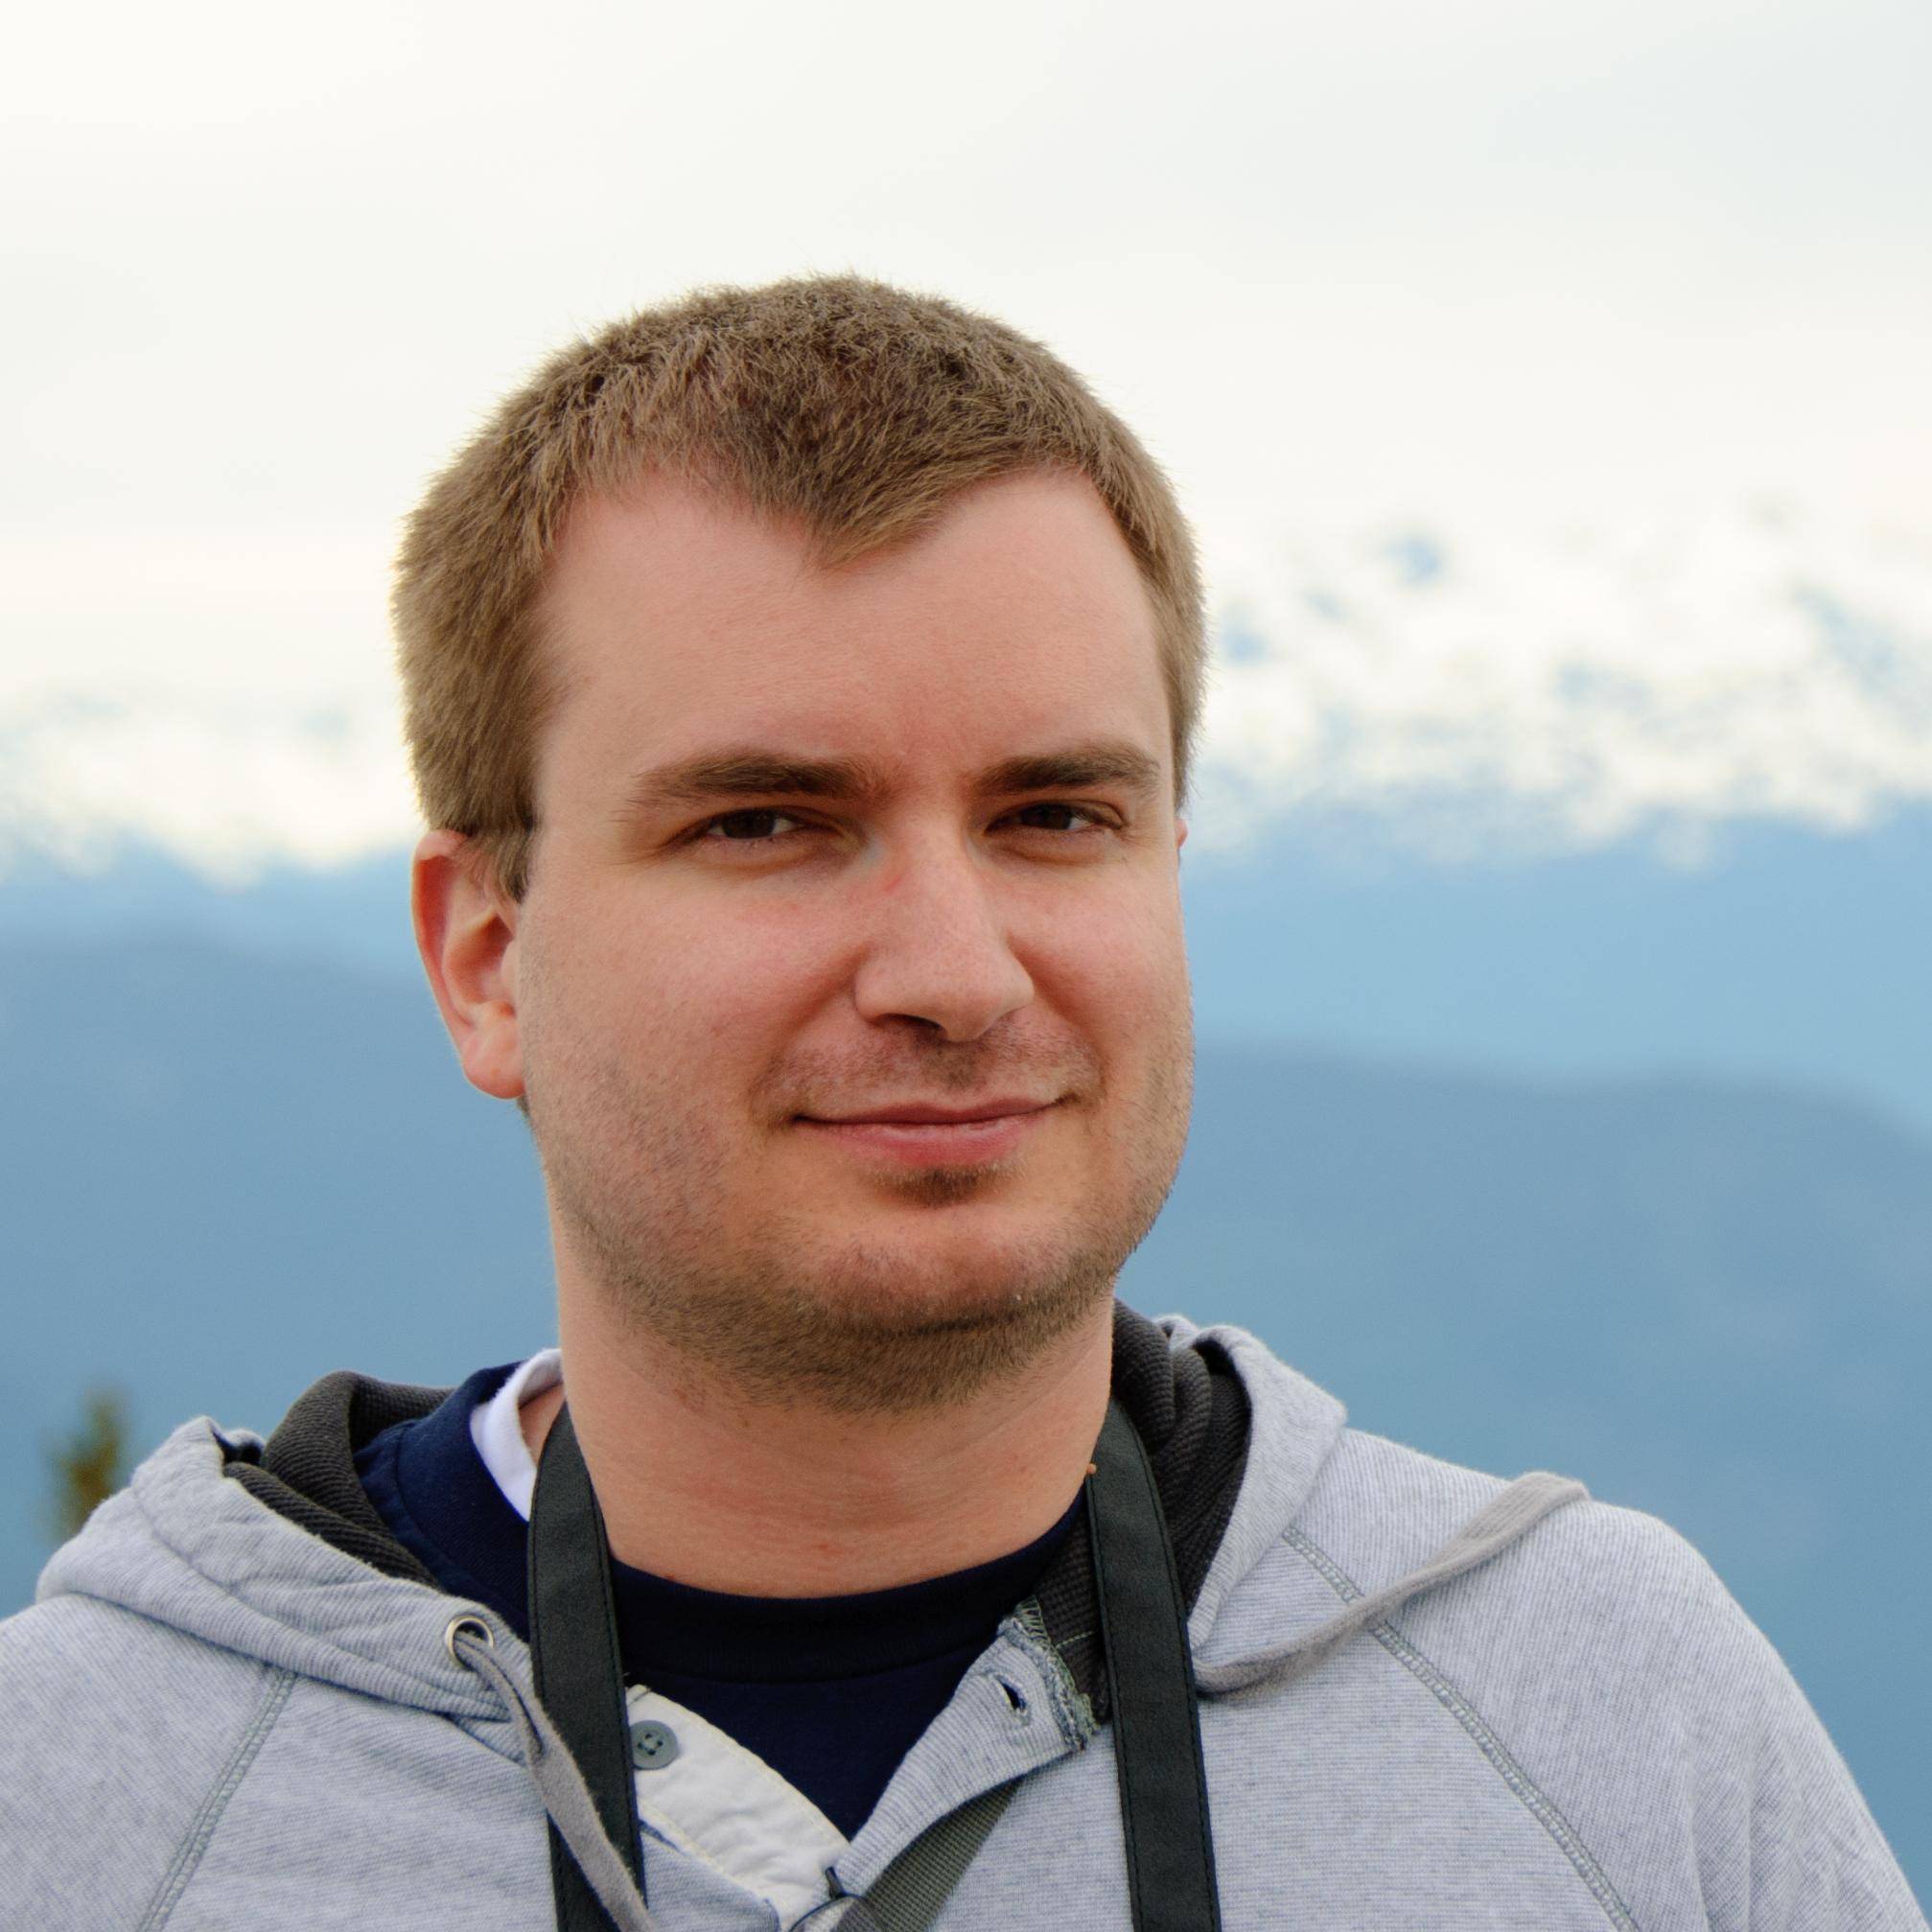 Vukićević at the 2010 Mozilla Summit in Whistler, British Columbia, Canada